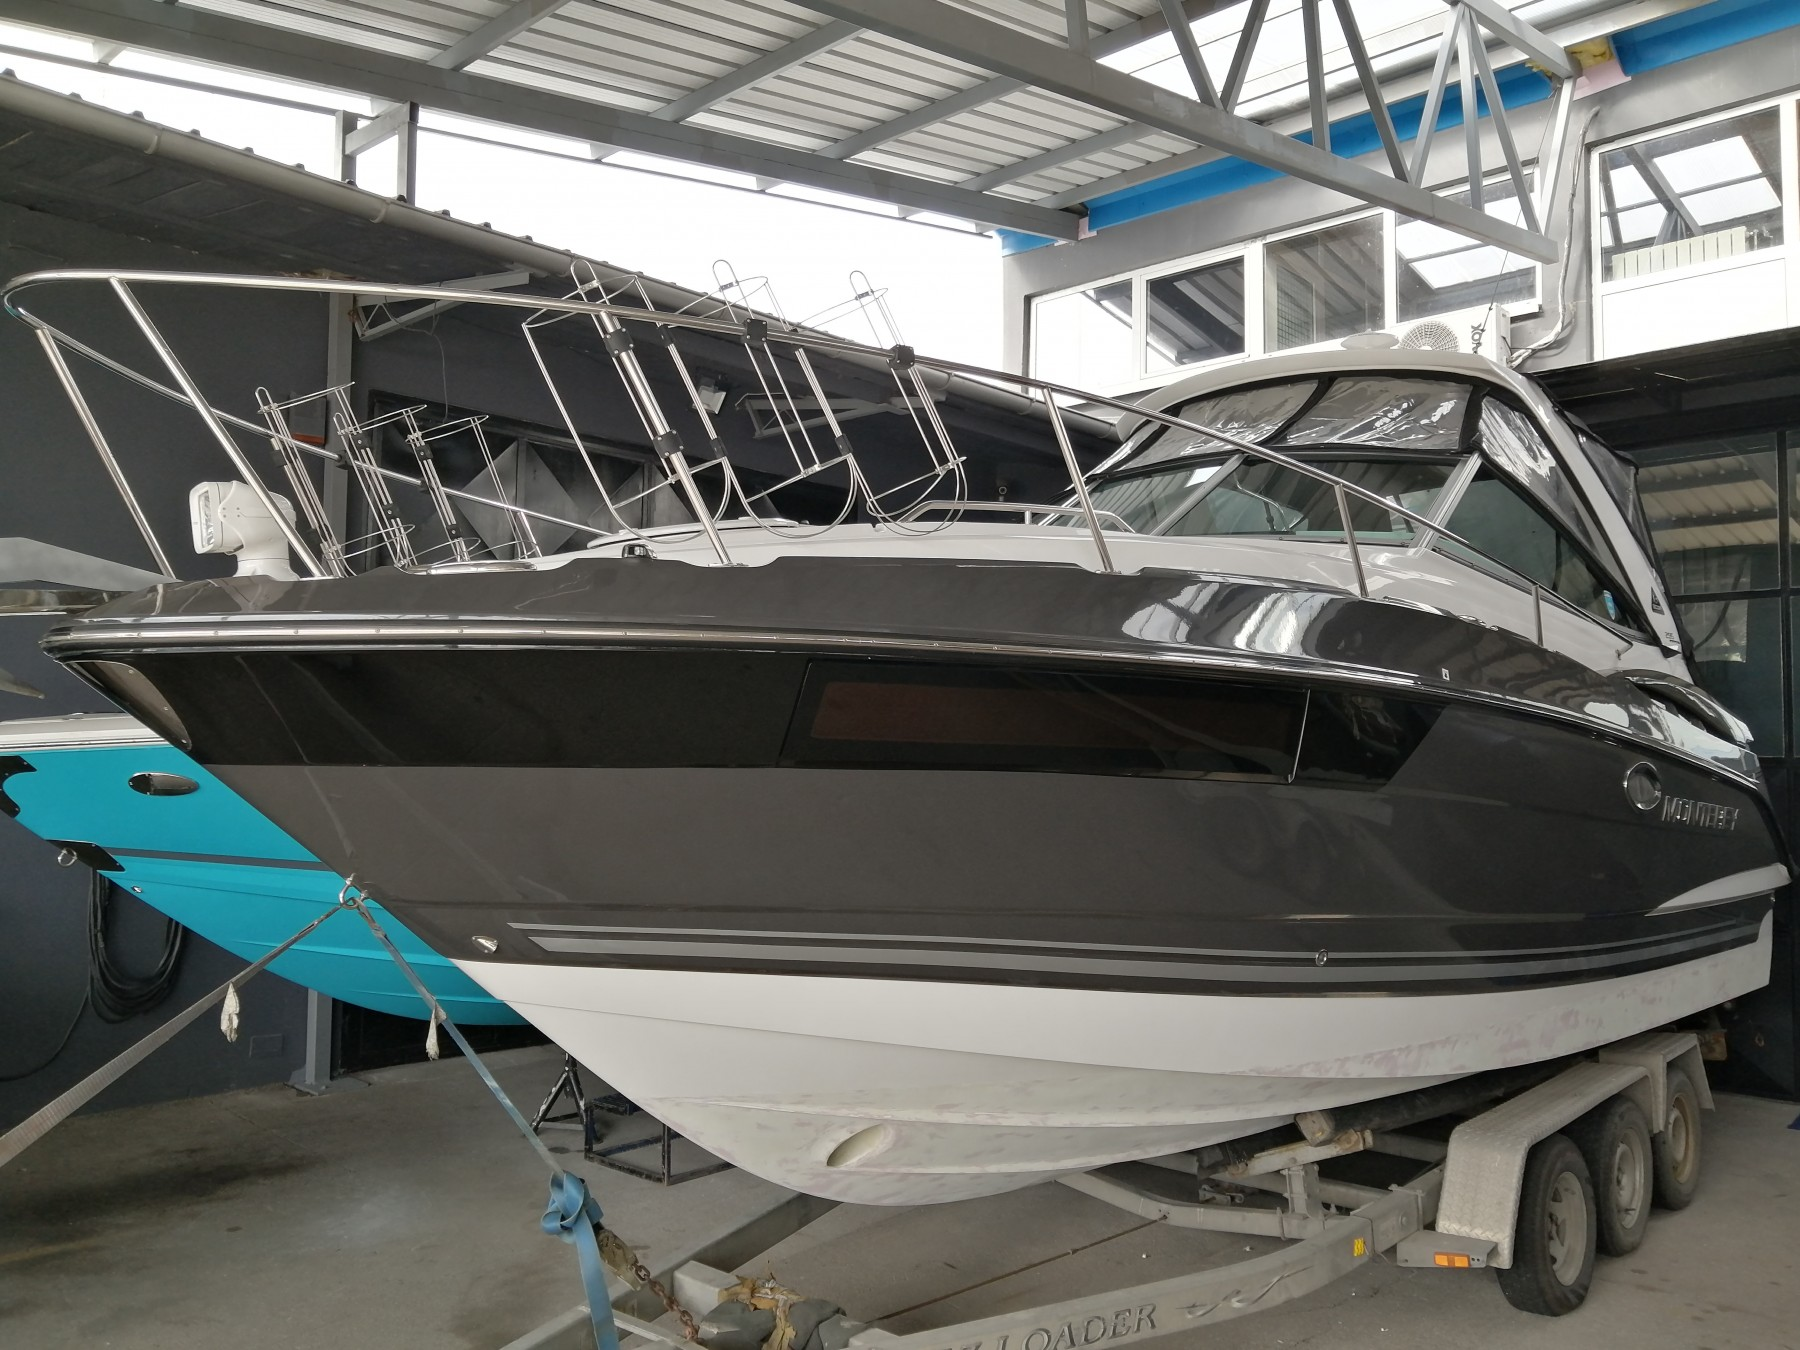 Monterey 295sy - BG955H (1)